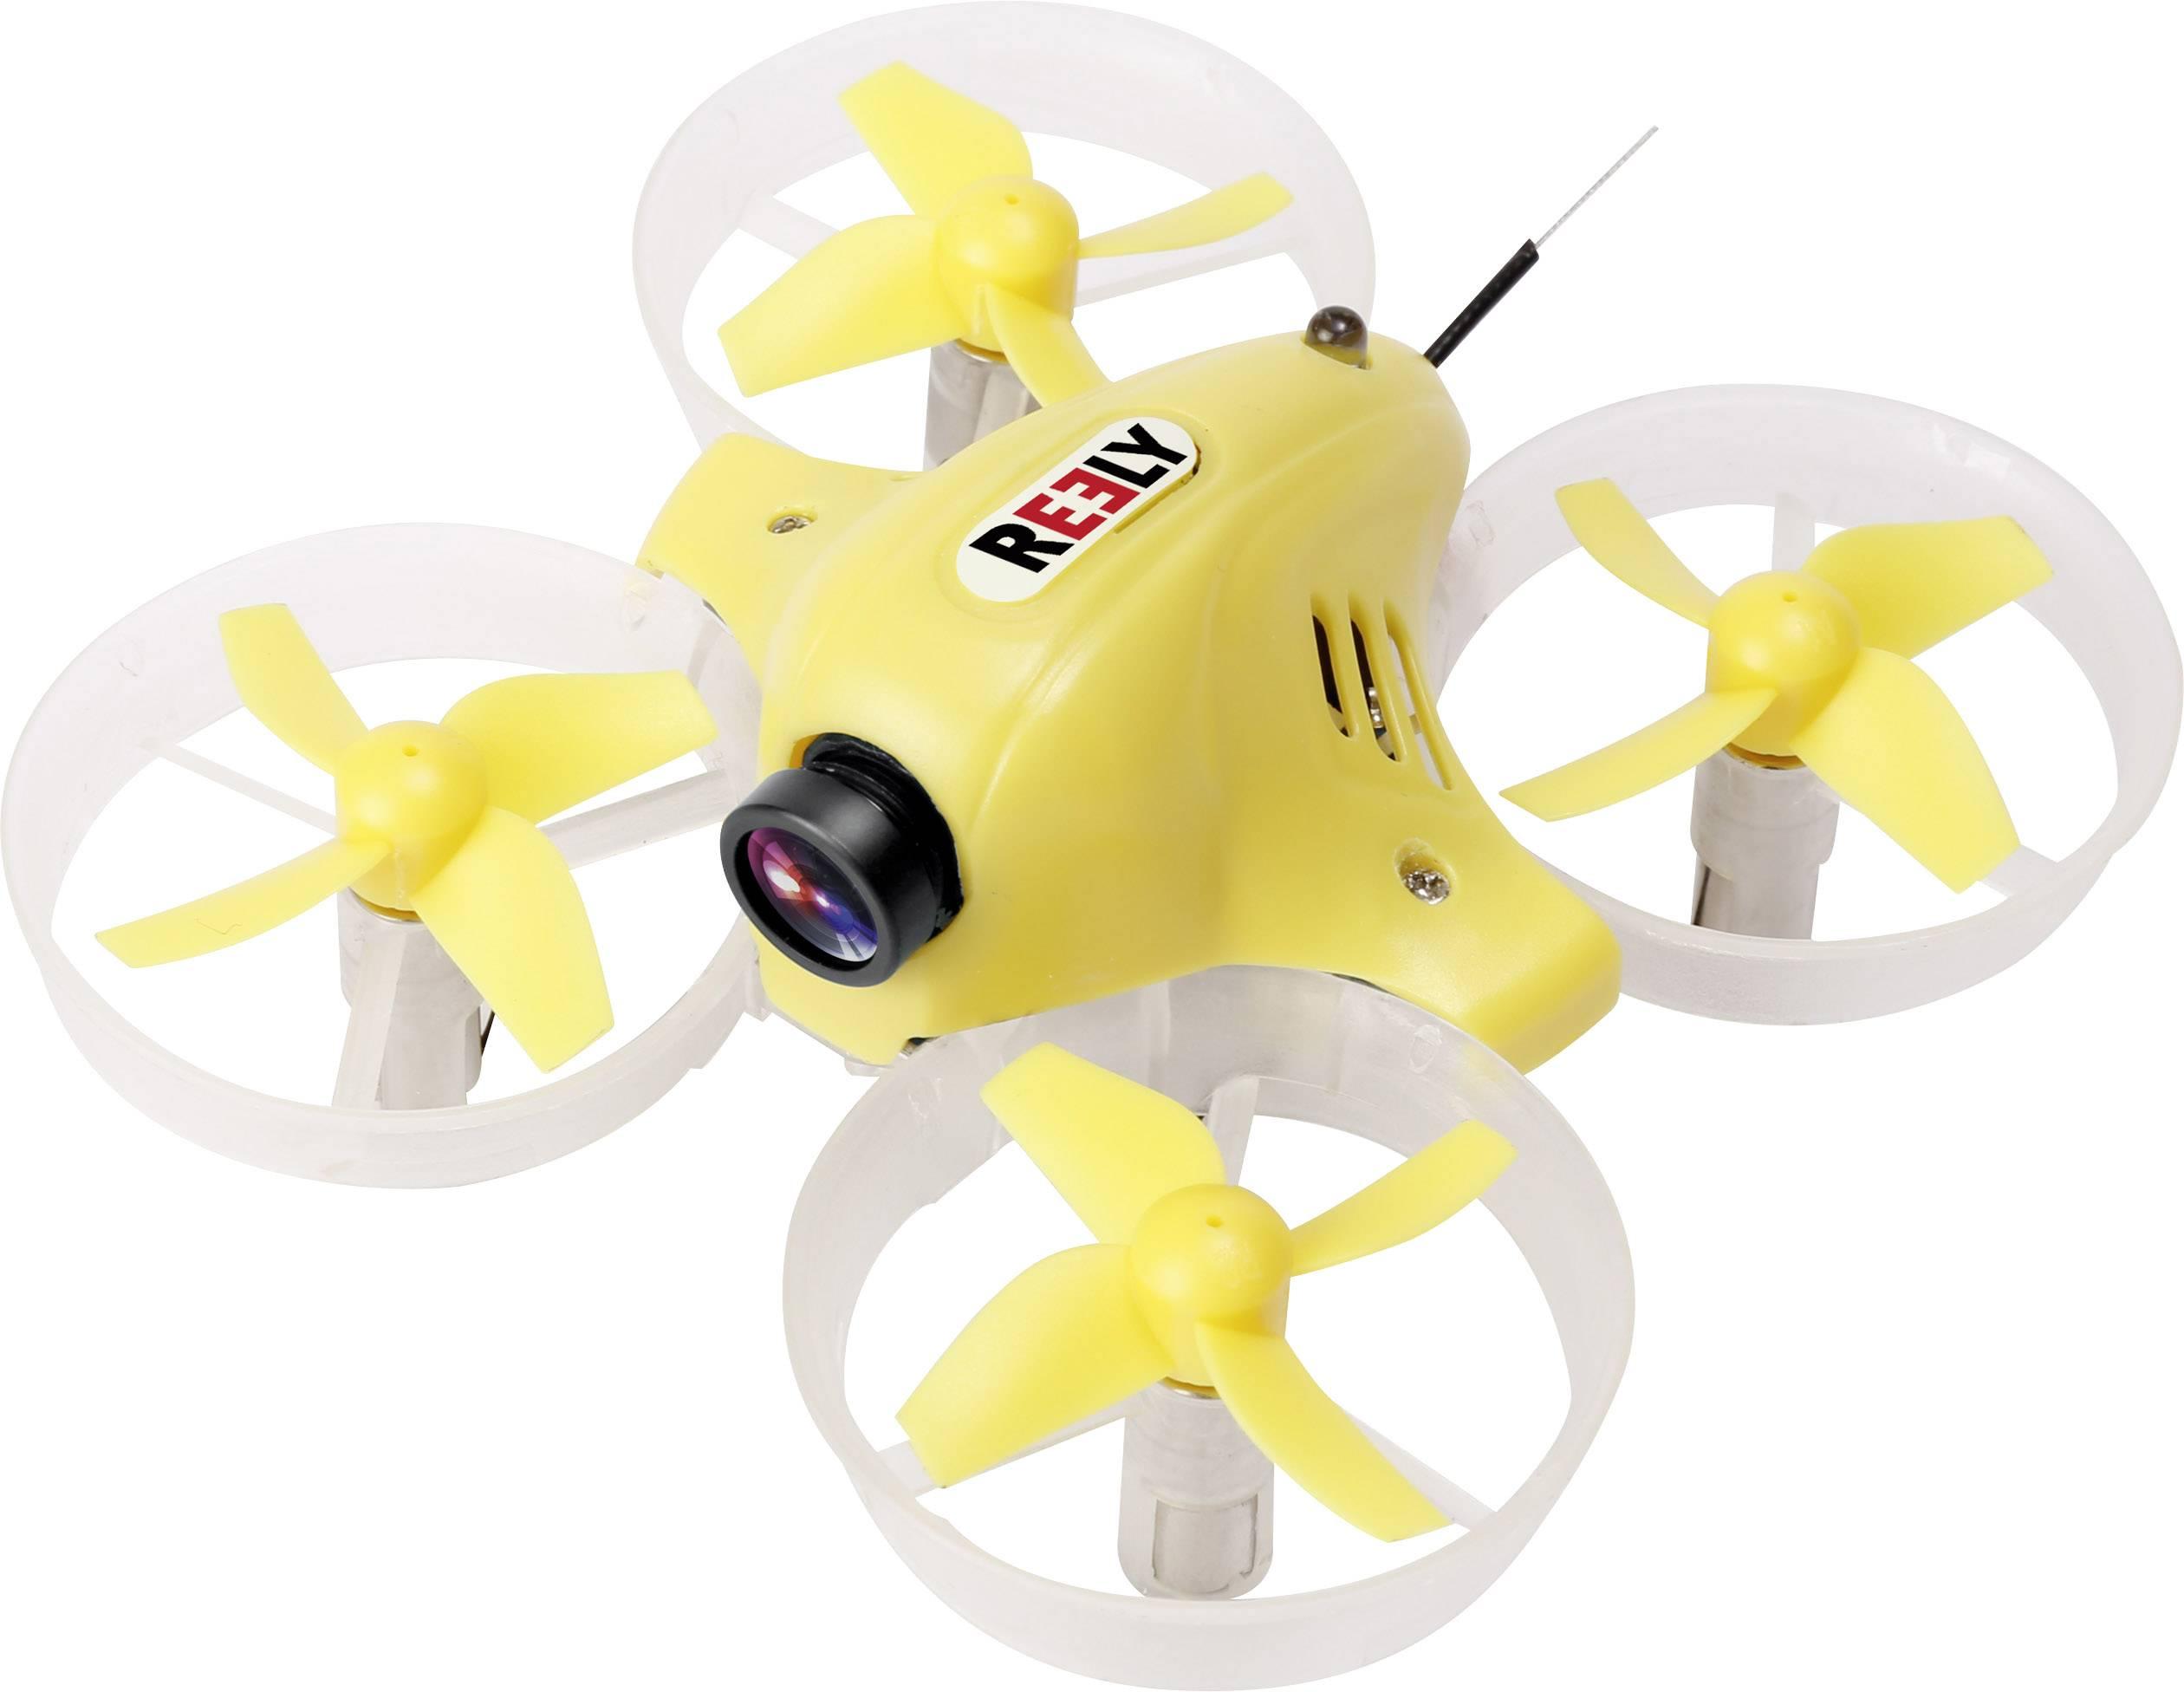 Drone da corsa Reely X-82 RtF